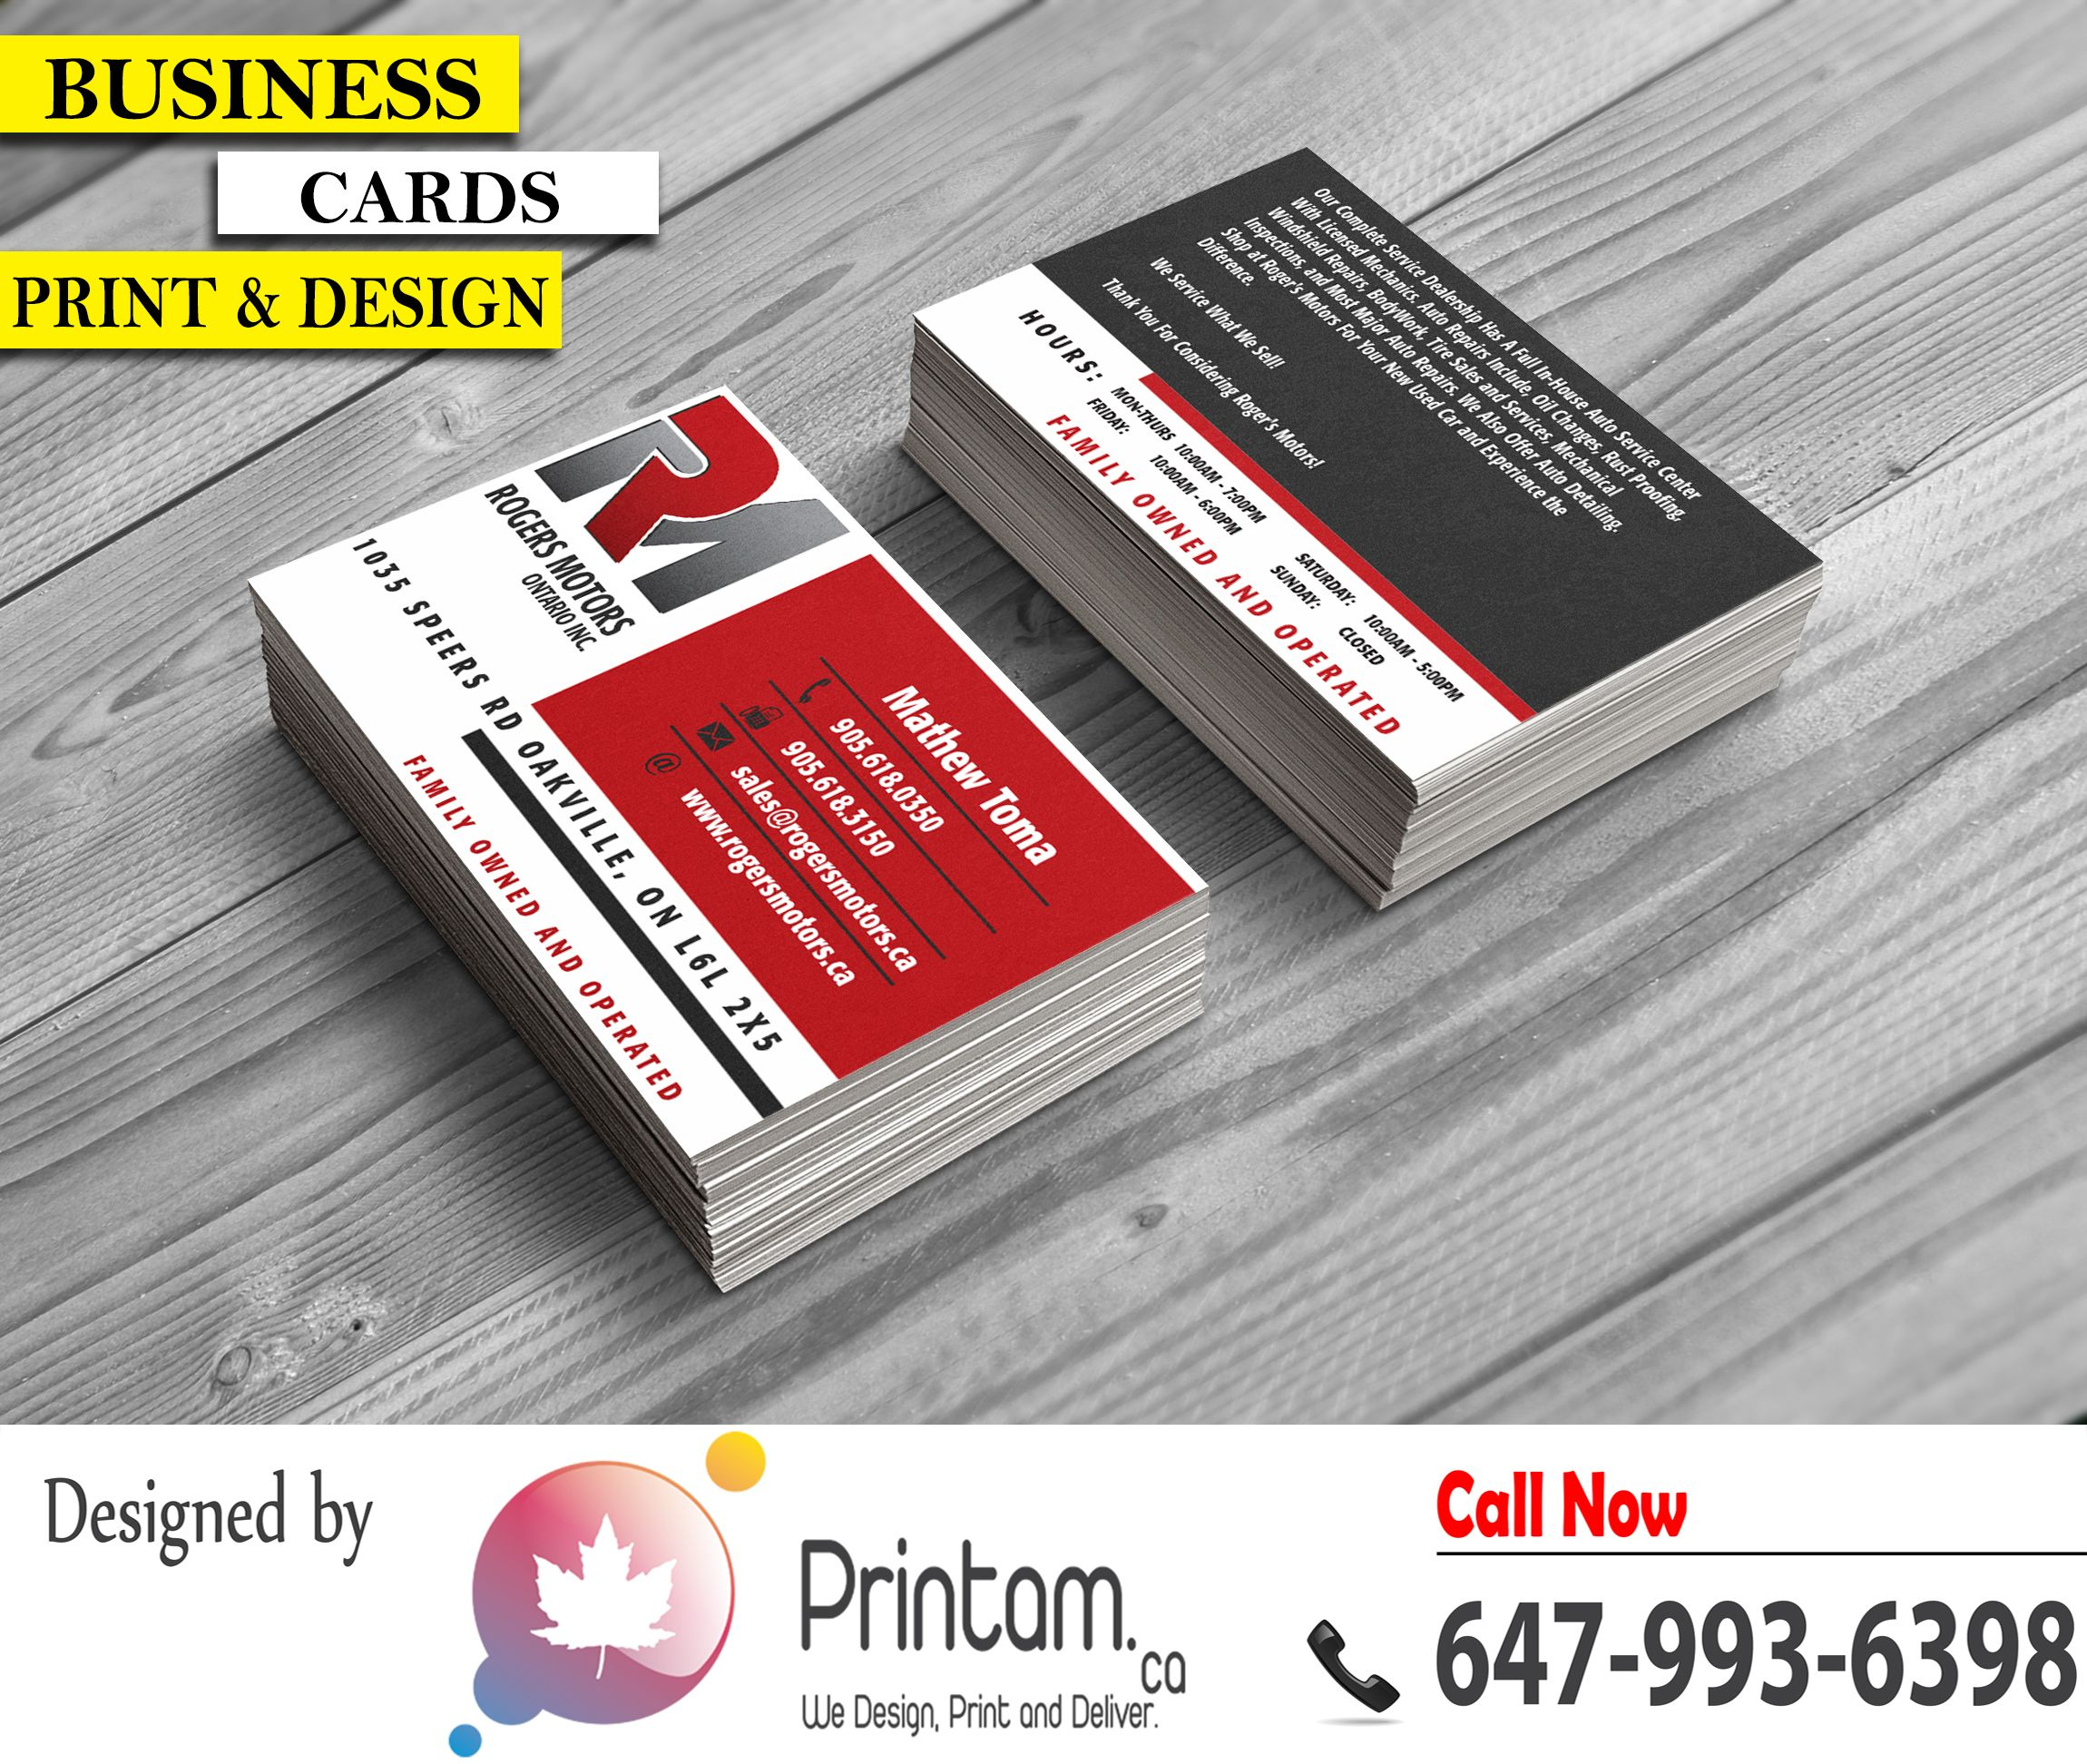 Printam Designs | Previous Client Business Card Designs | Pinterest